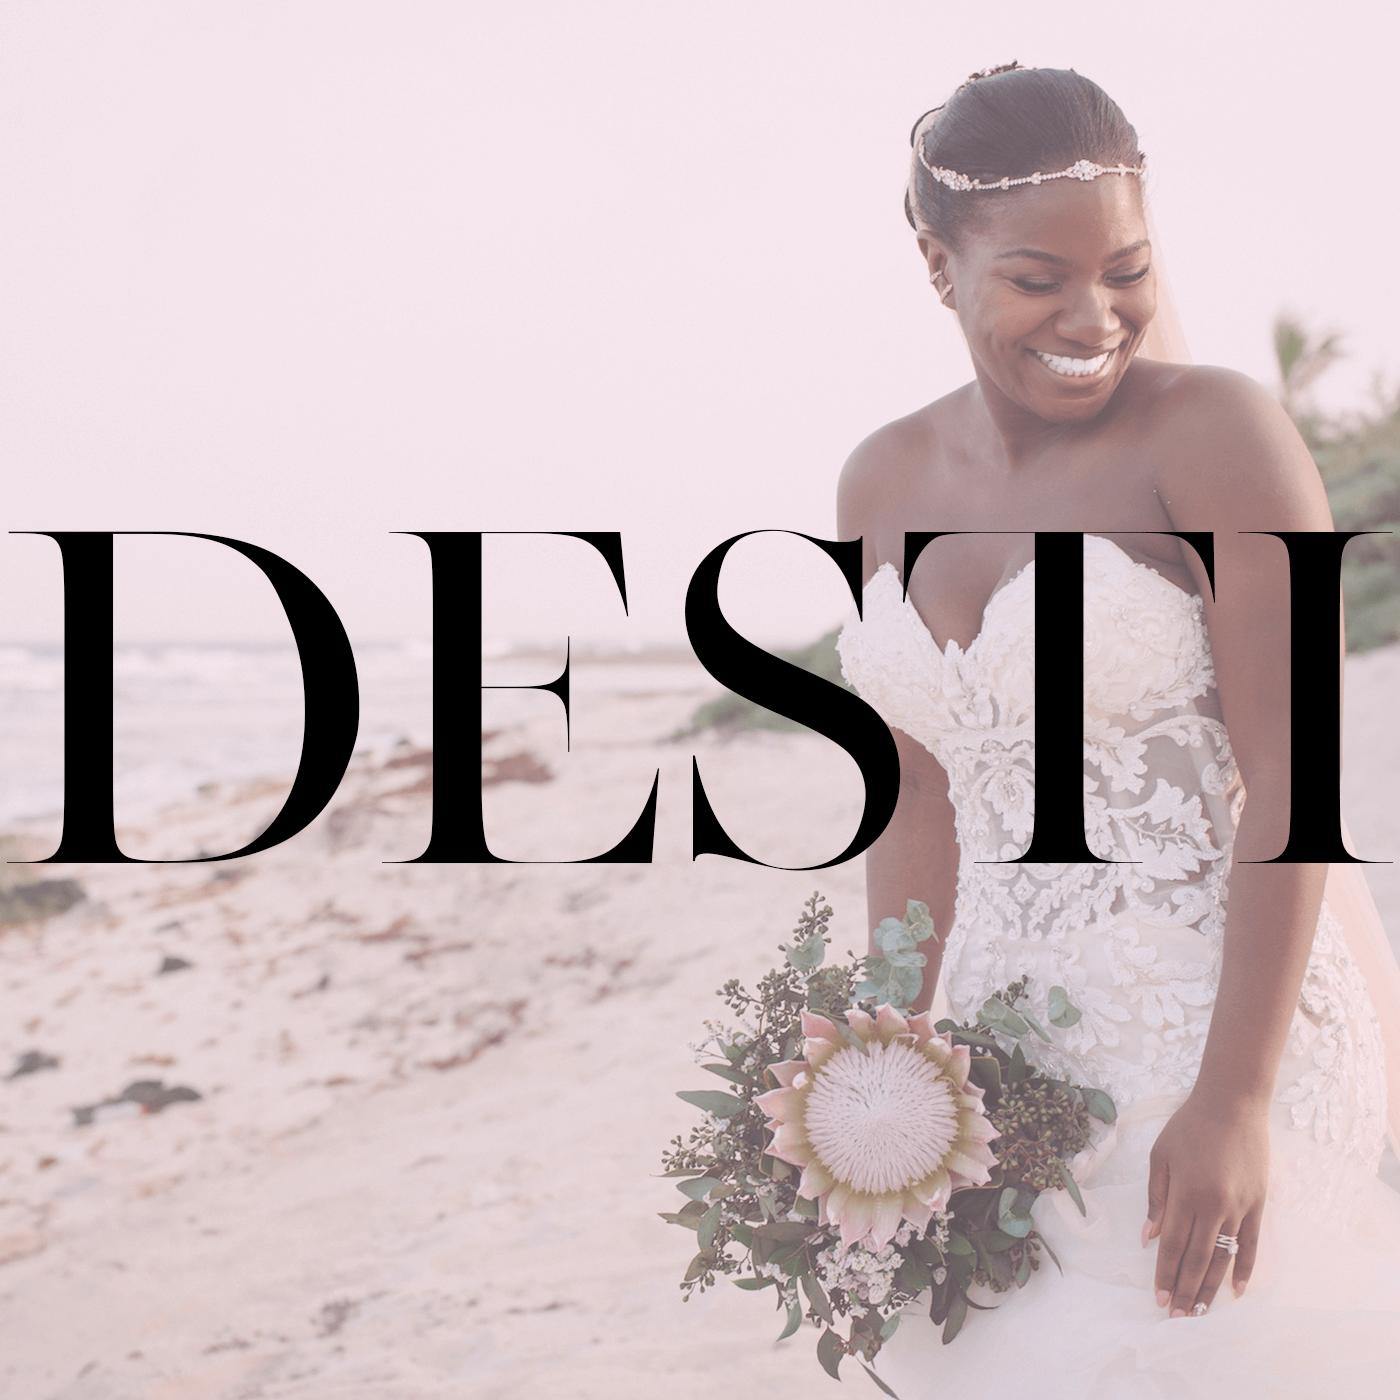 1400x1400 desti-guide-to-destination-weddings-podcast-desti-tv-omi-allen-black-desti-black-destination-bride-cover-final.png